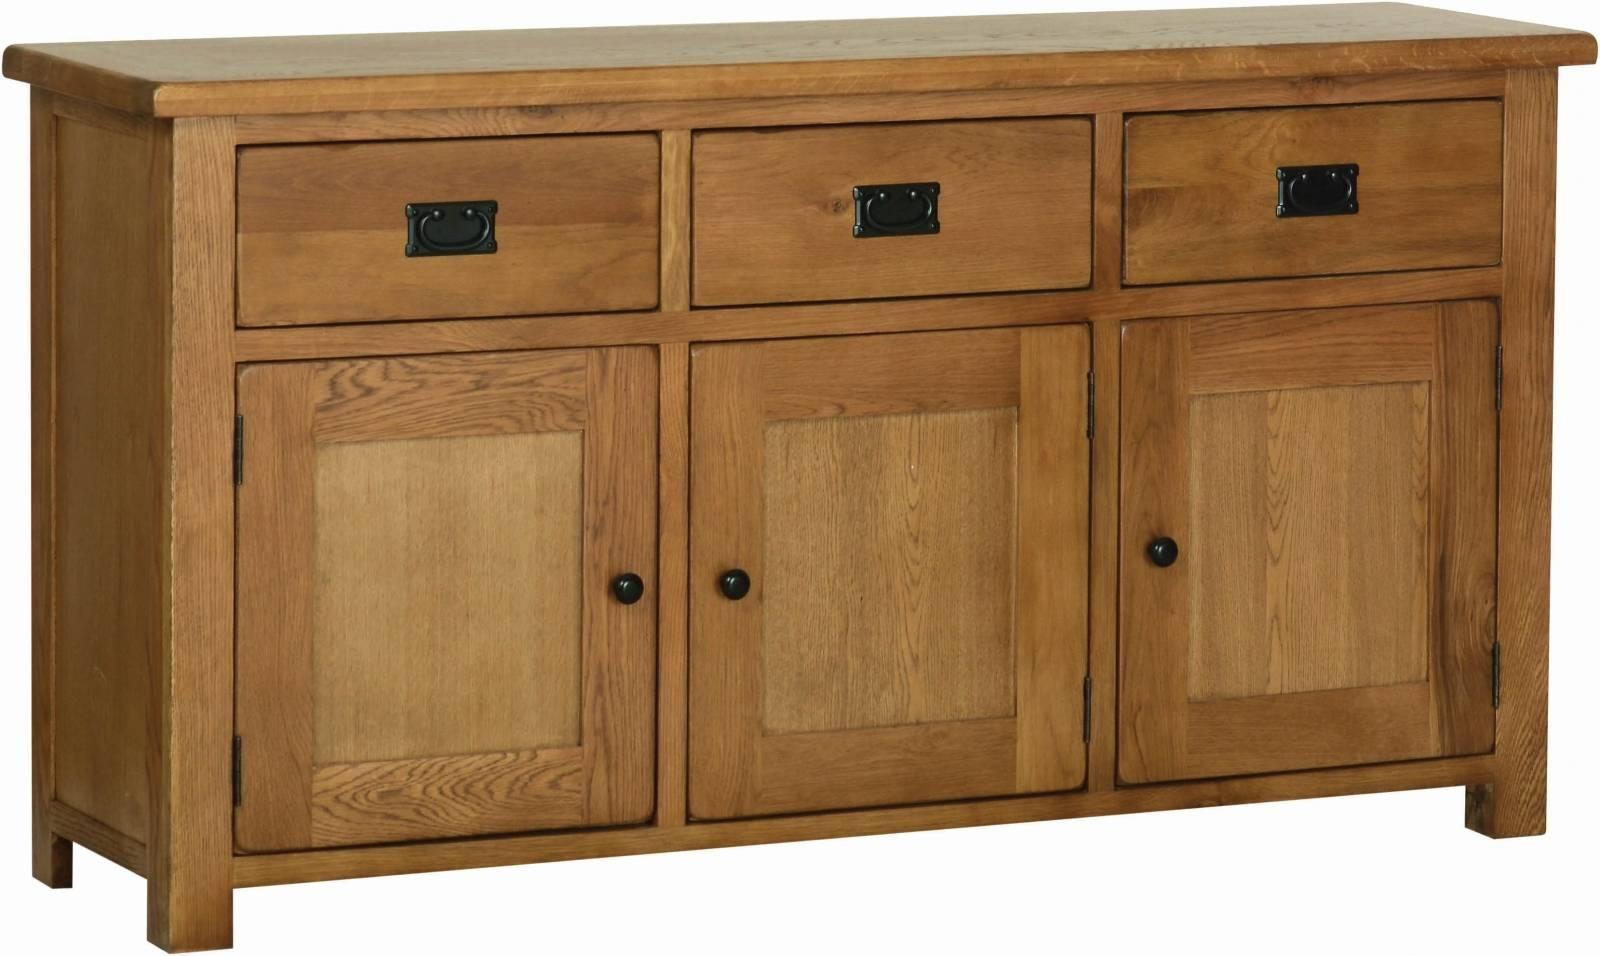 Oak Large Sideboard - Solid Wood & Painted Made To Measure regarding Rustic Oak Large Sideboards (Image 12 of 15)